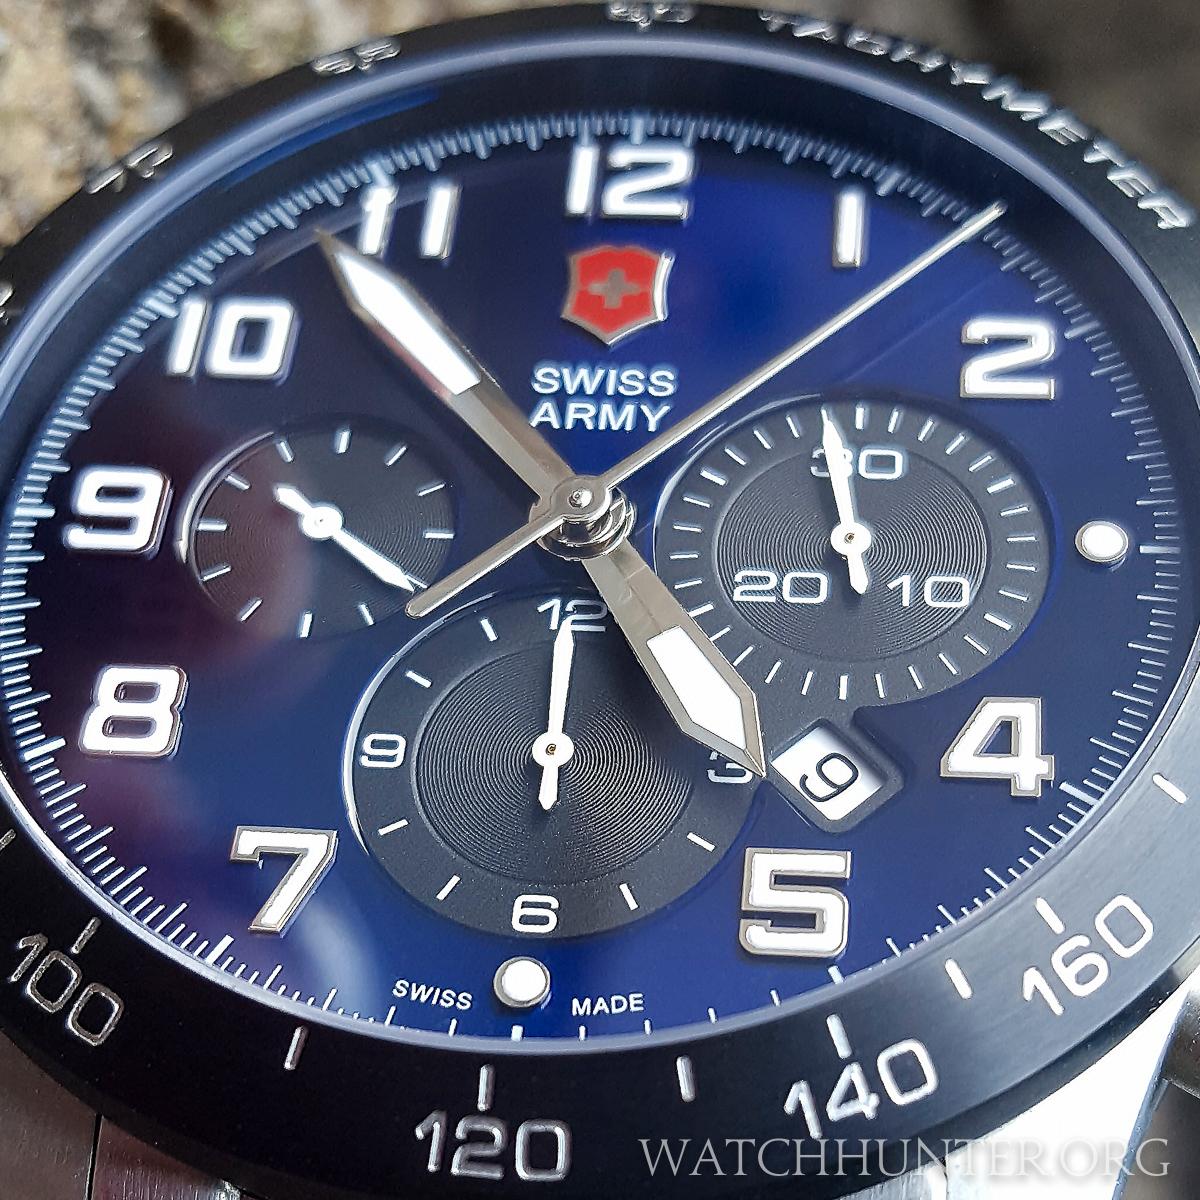 Name:  Victorinox-swiss-army-airboss-mach-6-limted-edition-24848-dial-closeup.jpg Views: 89 Size:  836.5 KB